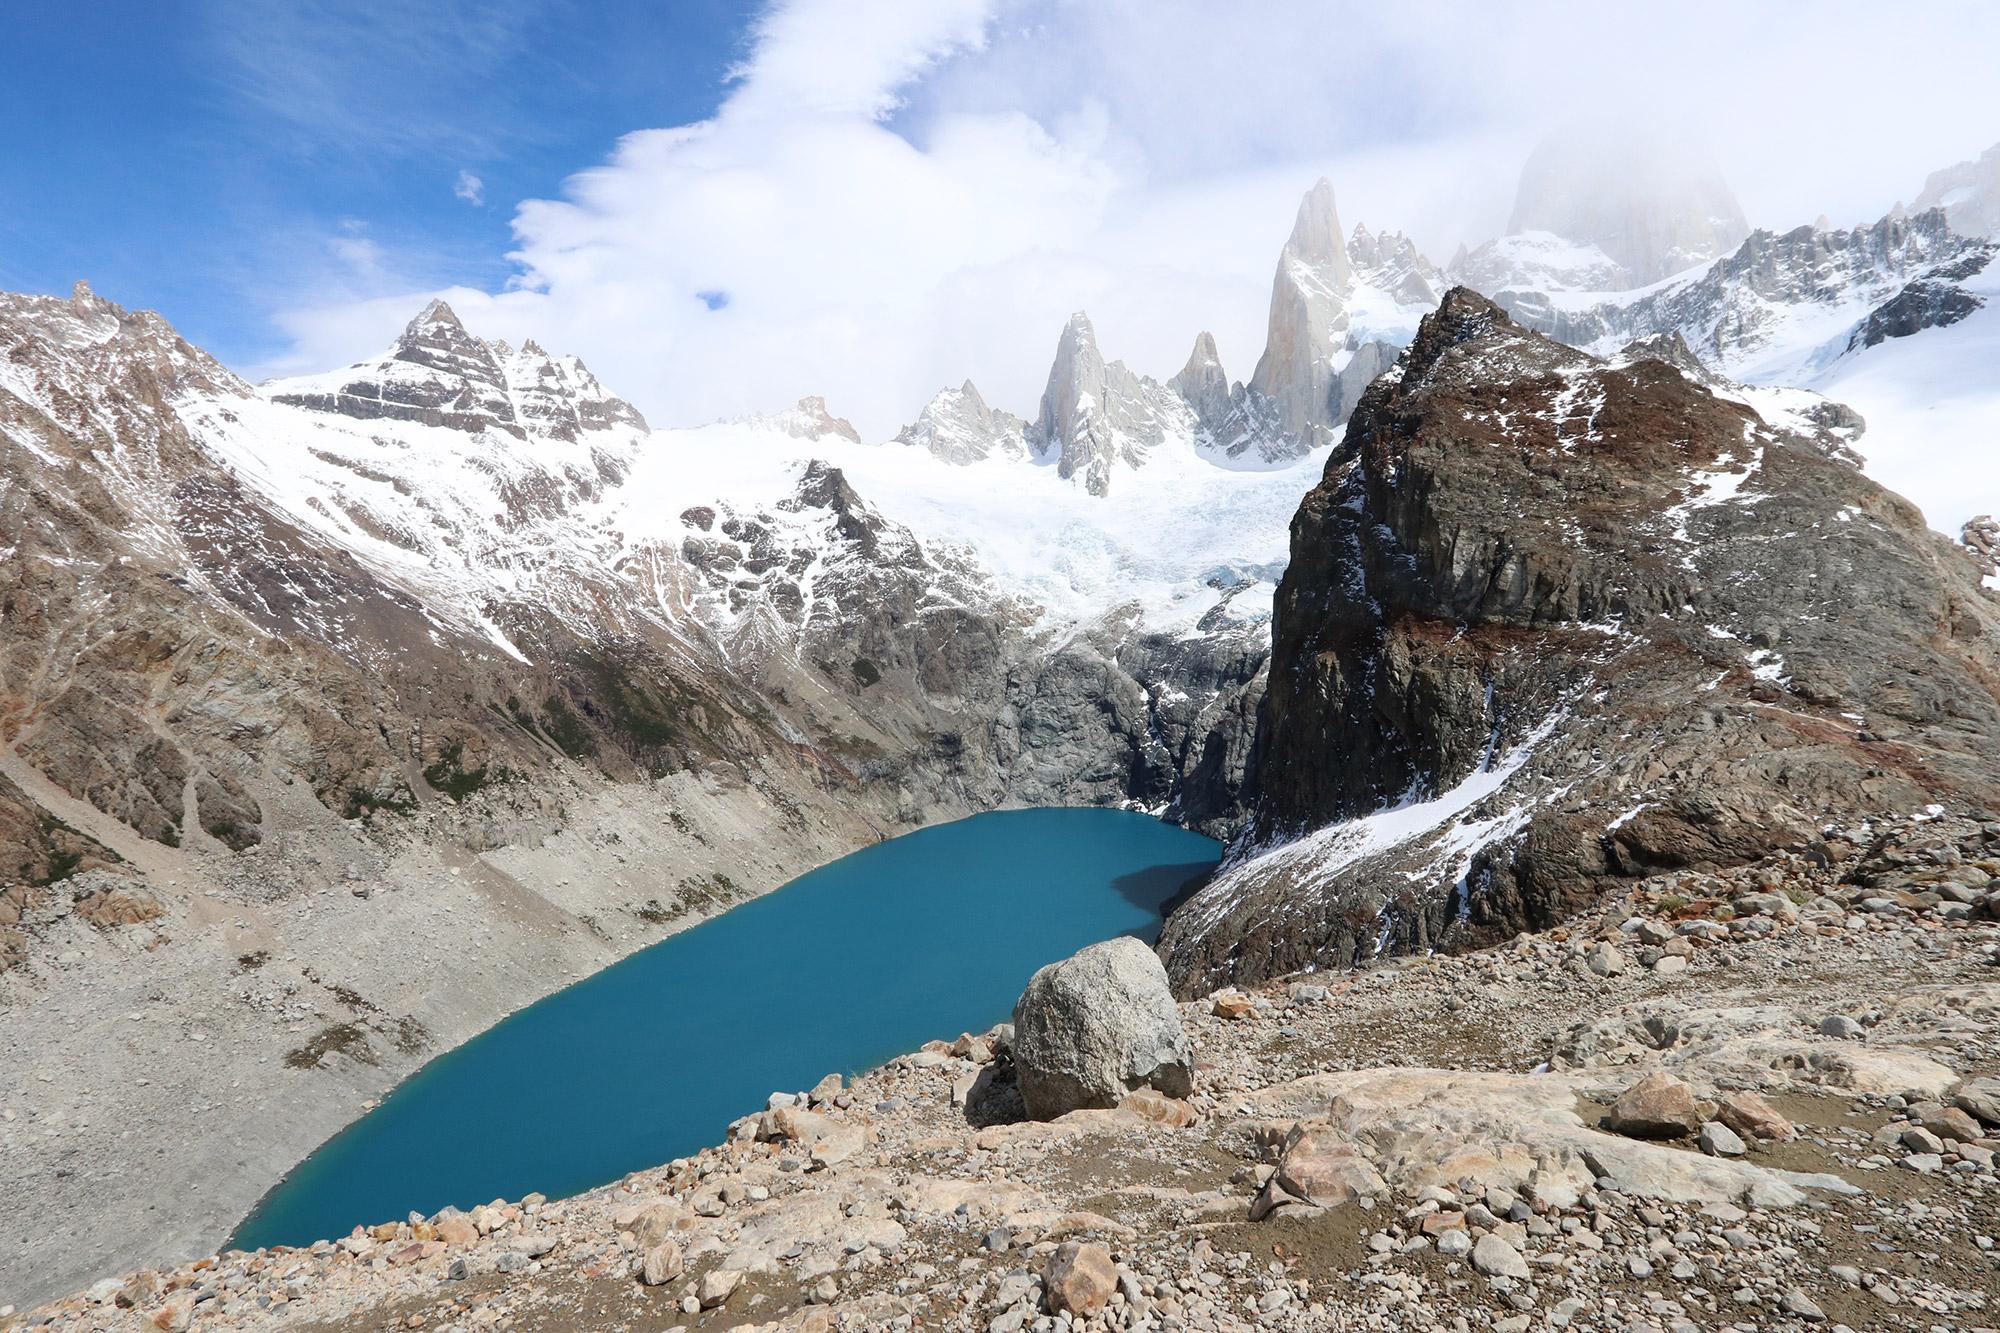 Reisverslag Patagonië - Laguna de los tres